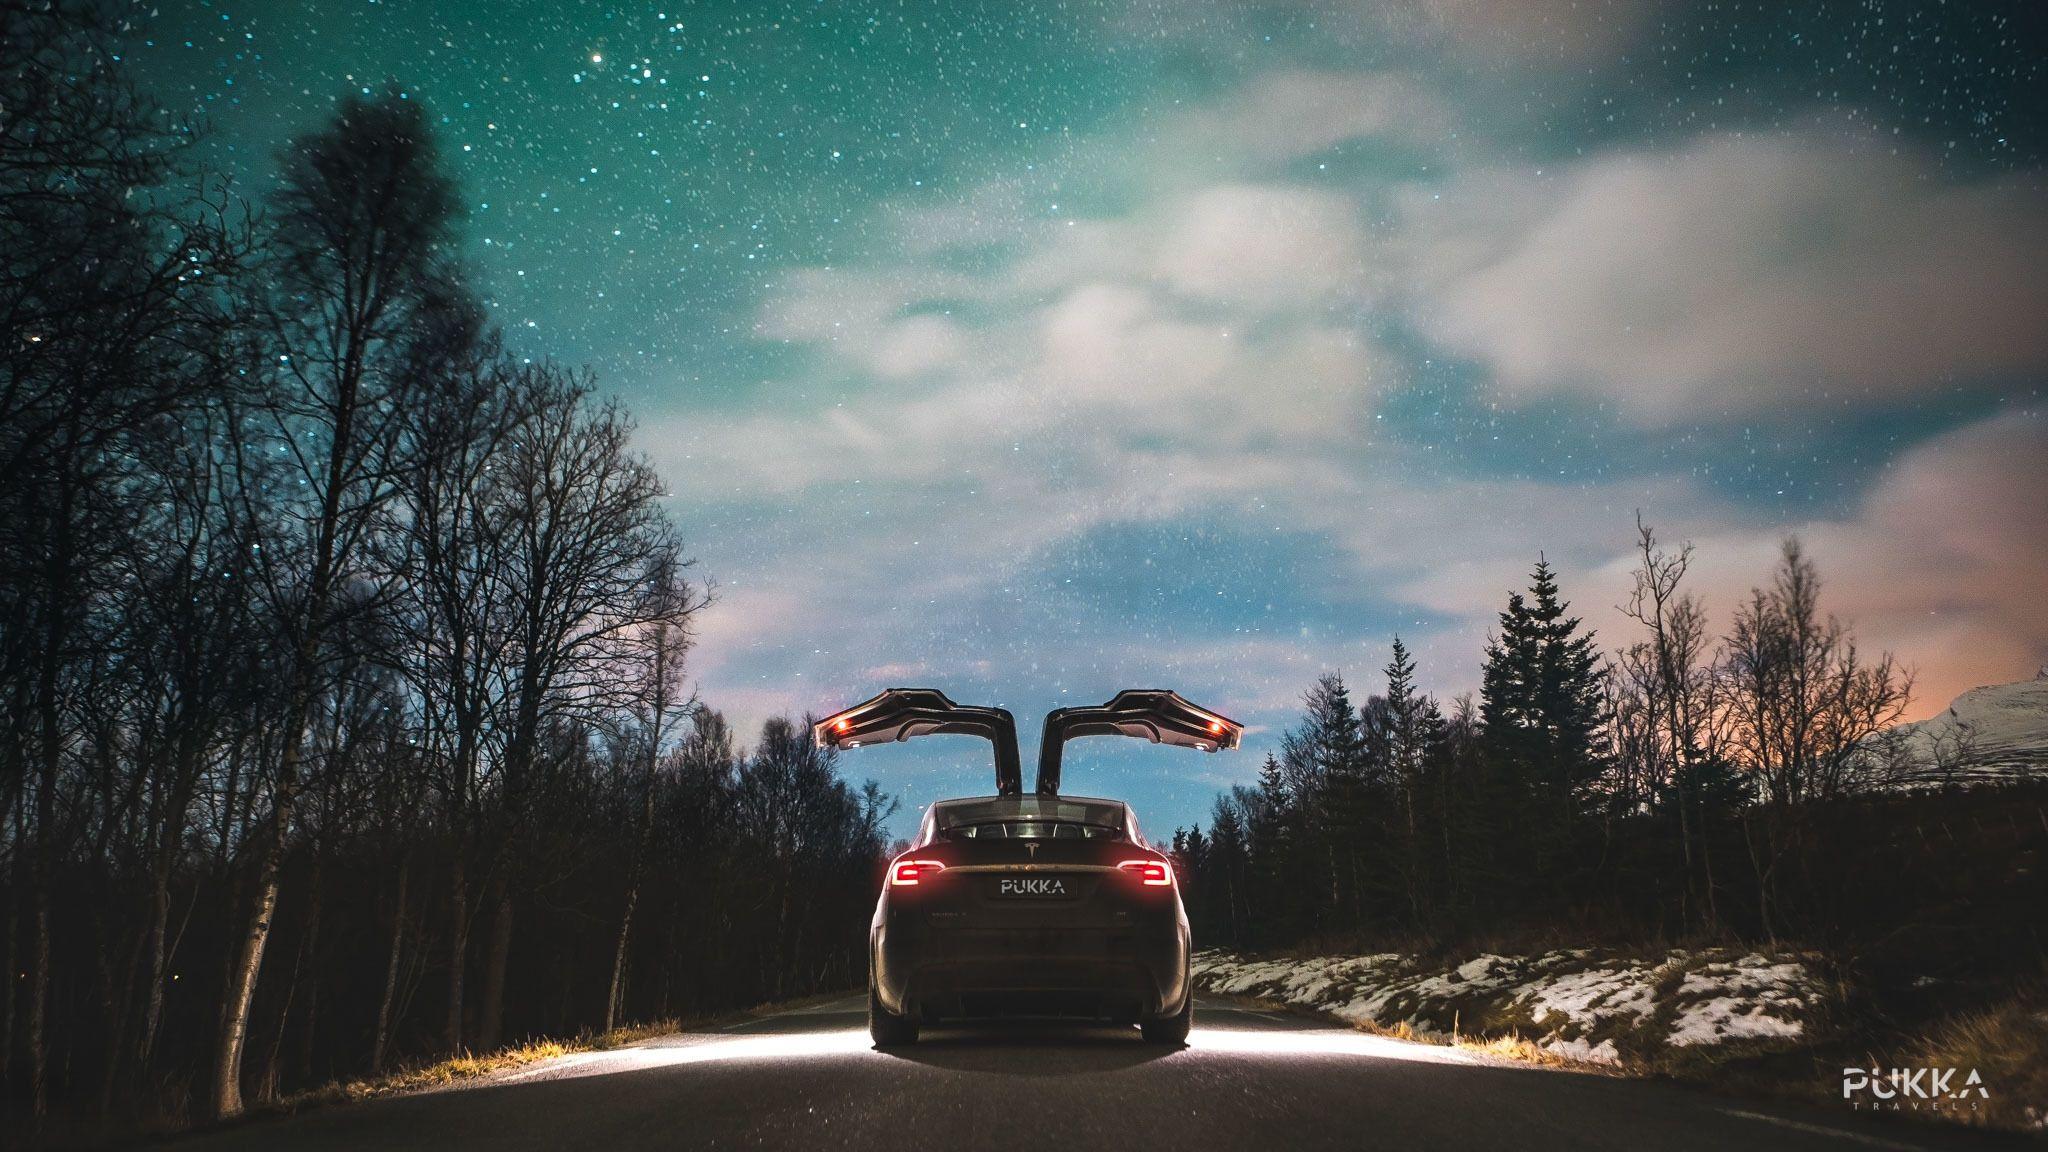 A Tesla vehicle at dusk